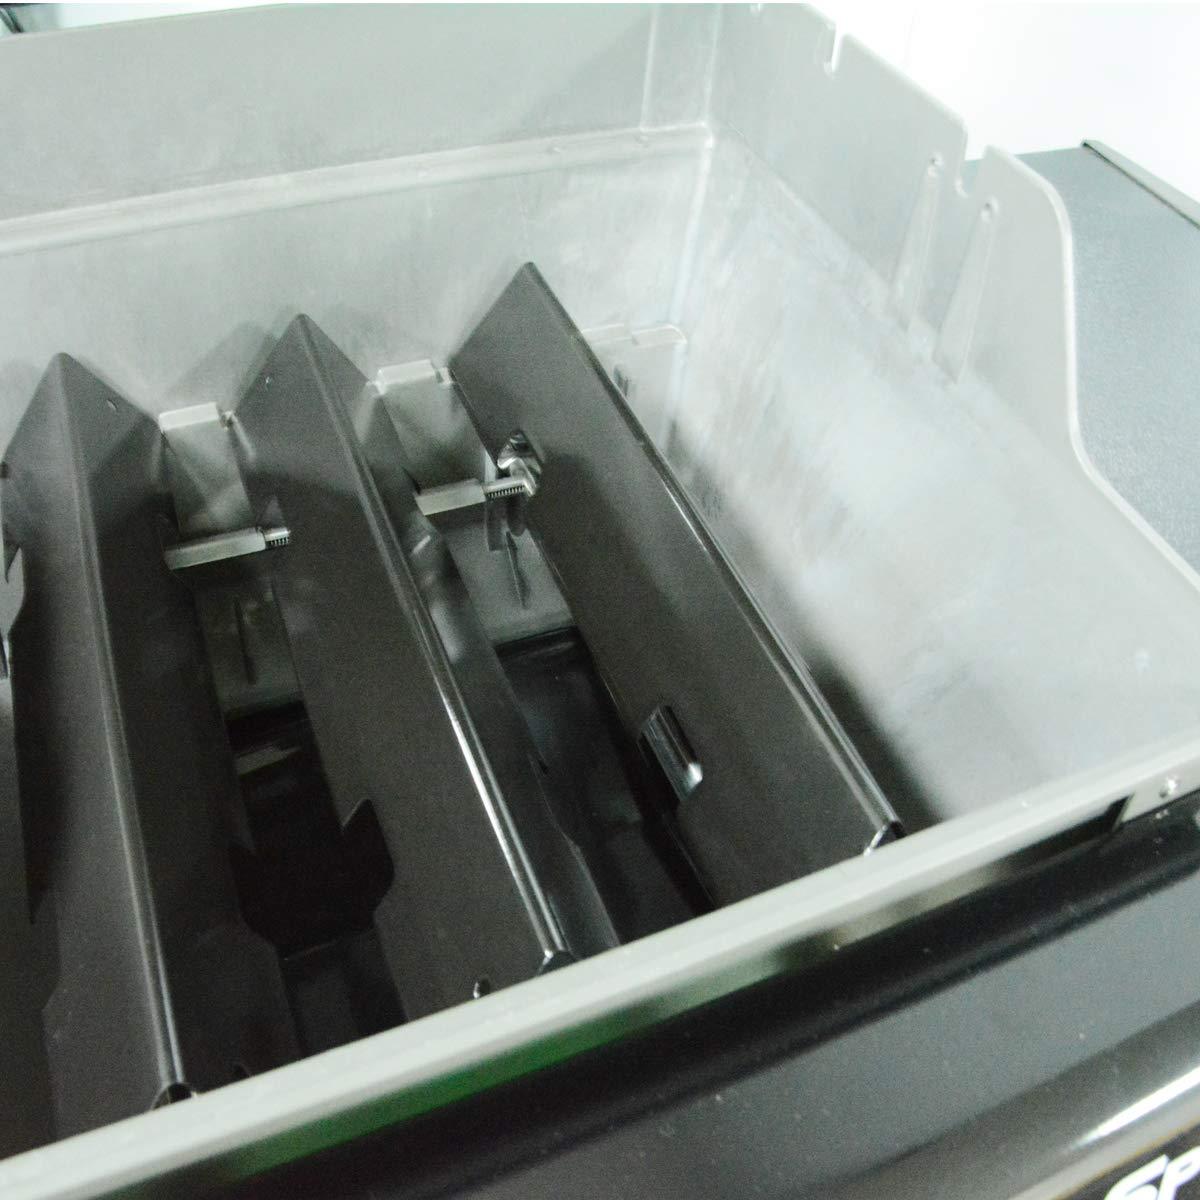 onlyfire Porcelain Enameled Flavorizer Bar for Weber Spirit II and Spirit II LX 200 Series Gas Grill